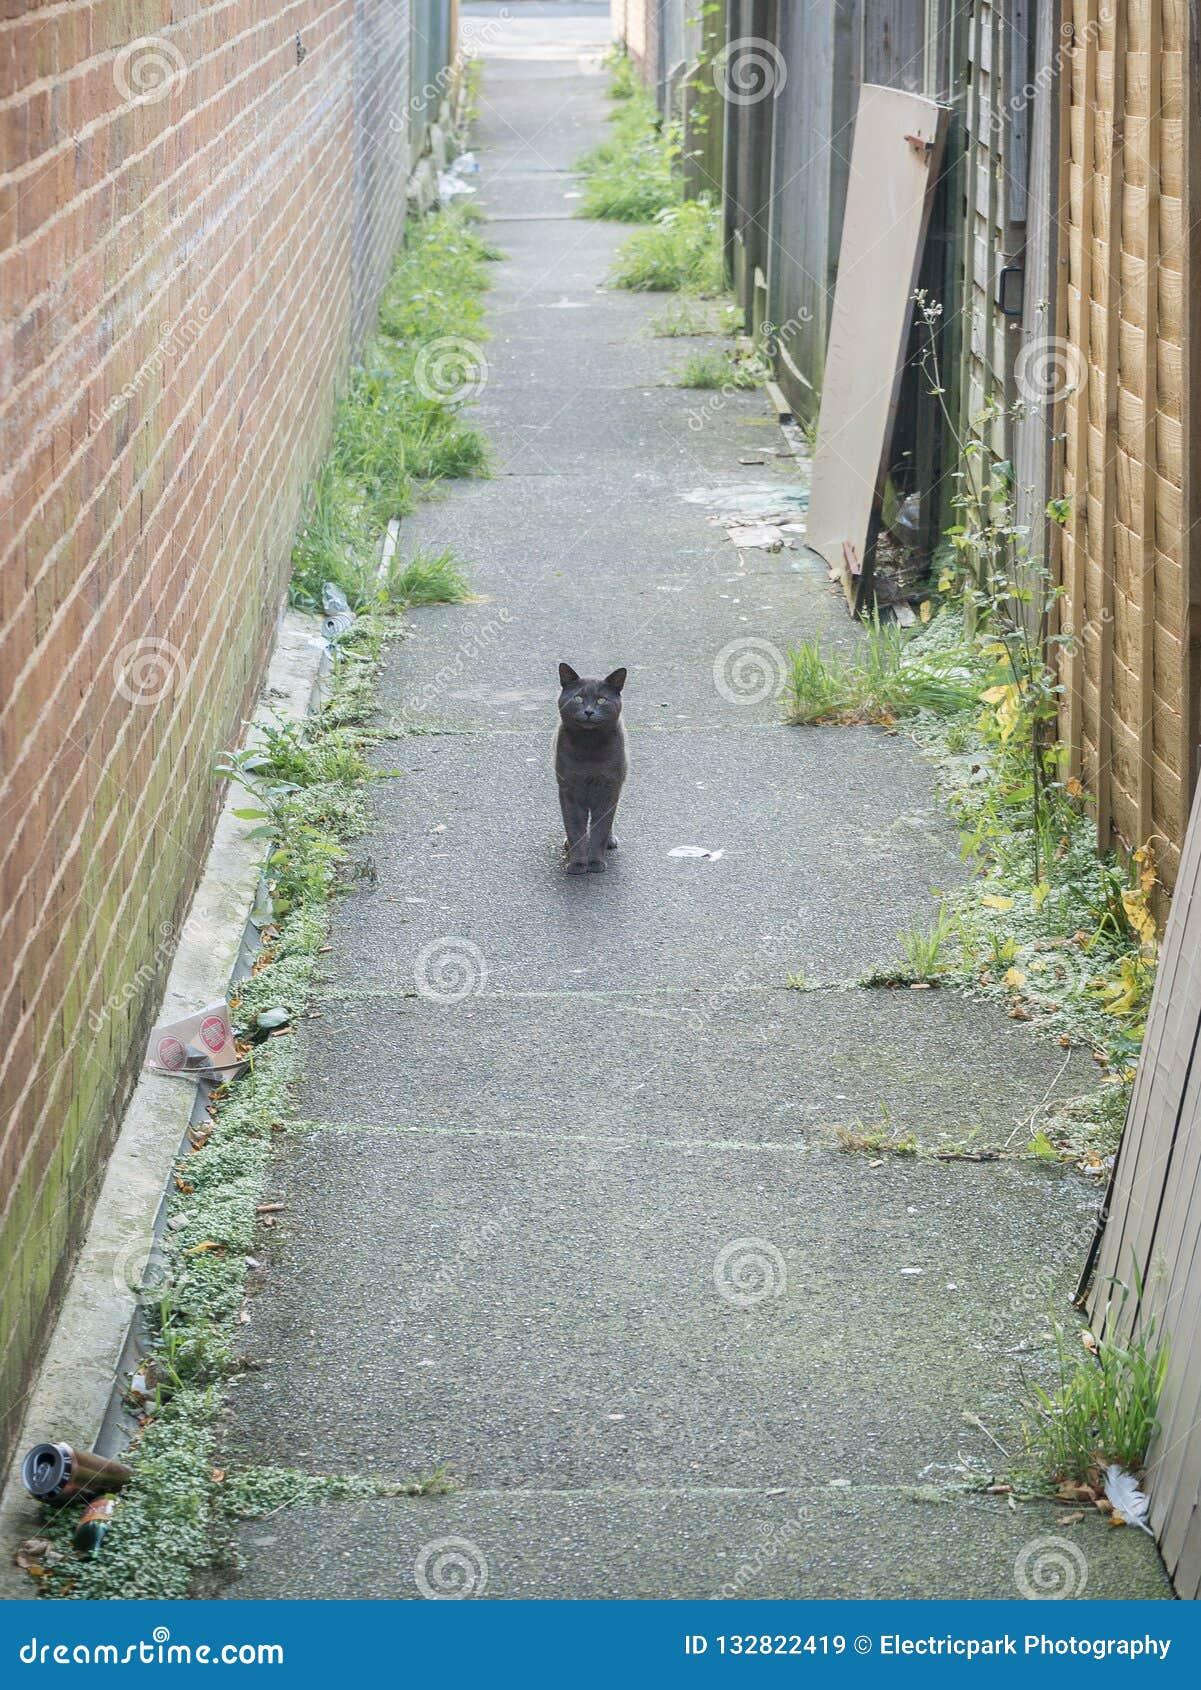 Alley Cat, Hampden Park, East Sussex, UK